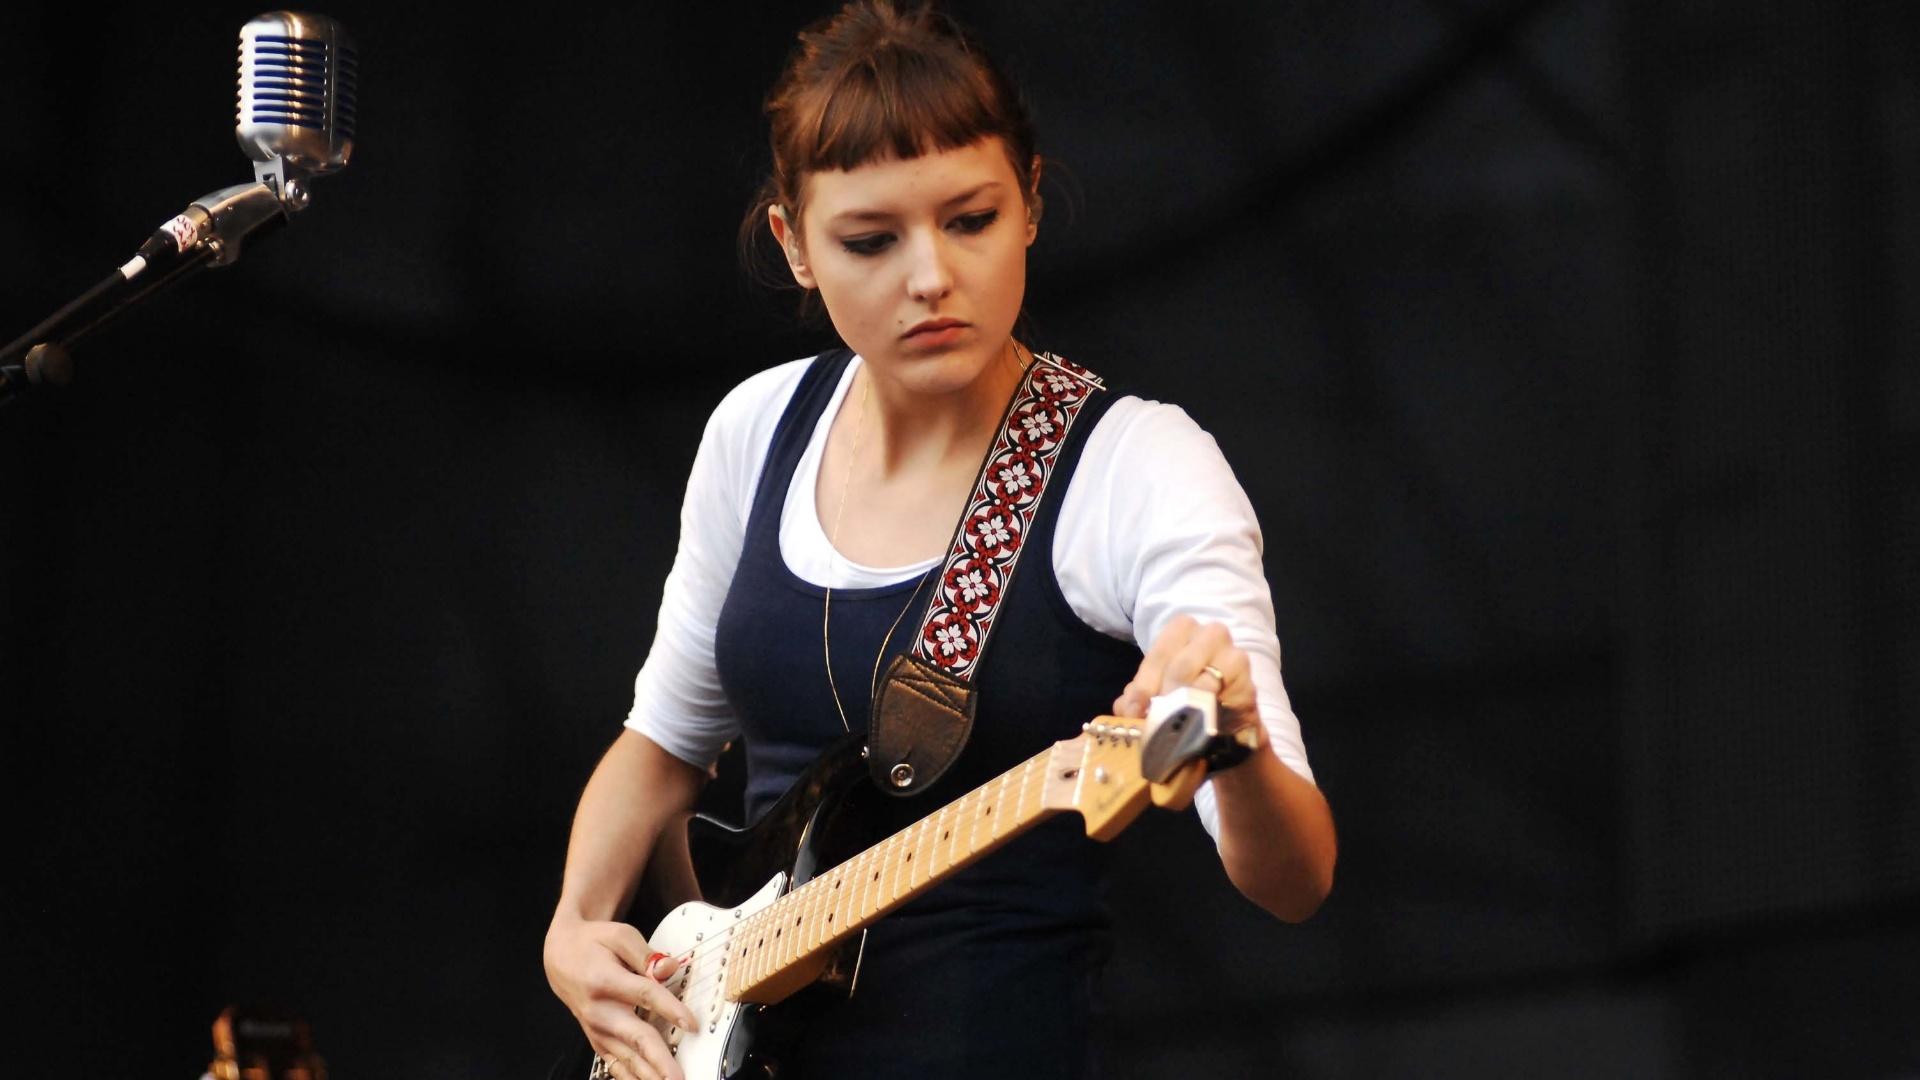 A cantora Mallu Magalhães se apresenta no palco Sonora Main Stage no Planeta Terra 2012 (20/10/12)